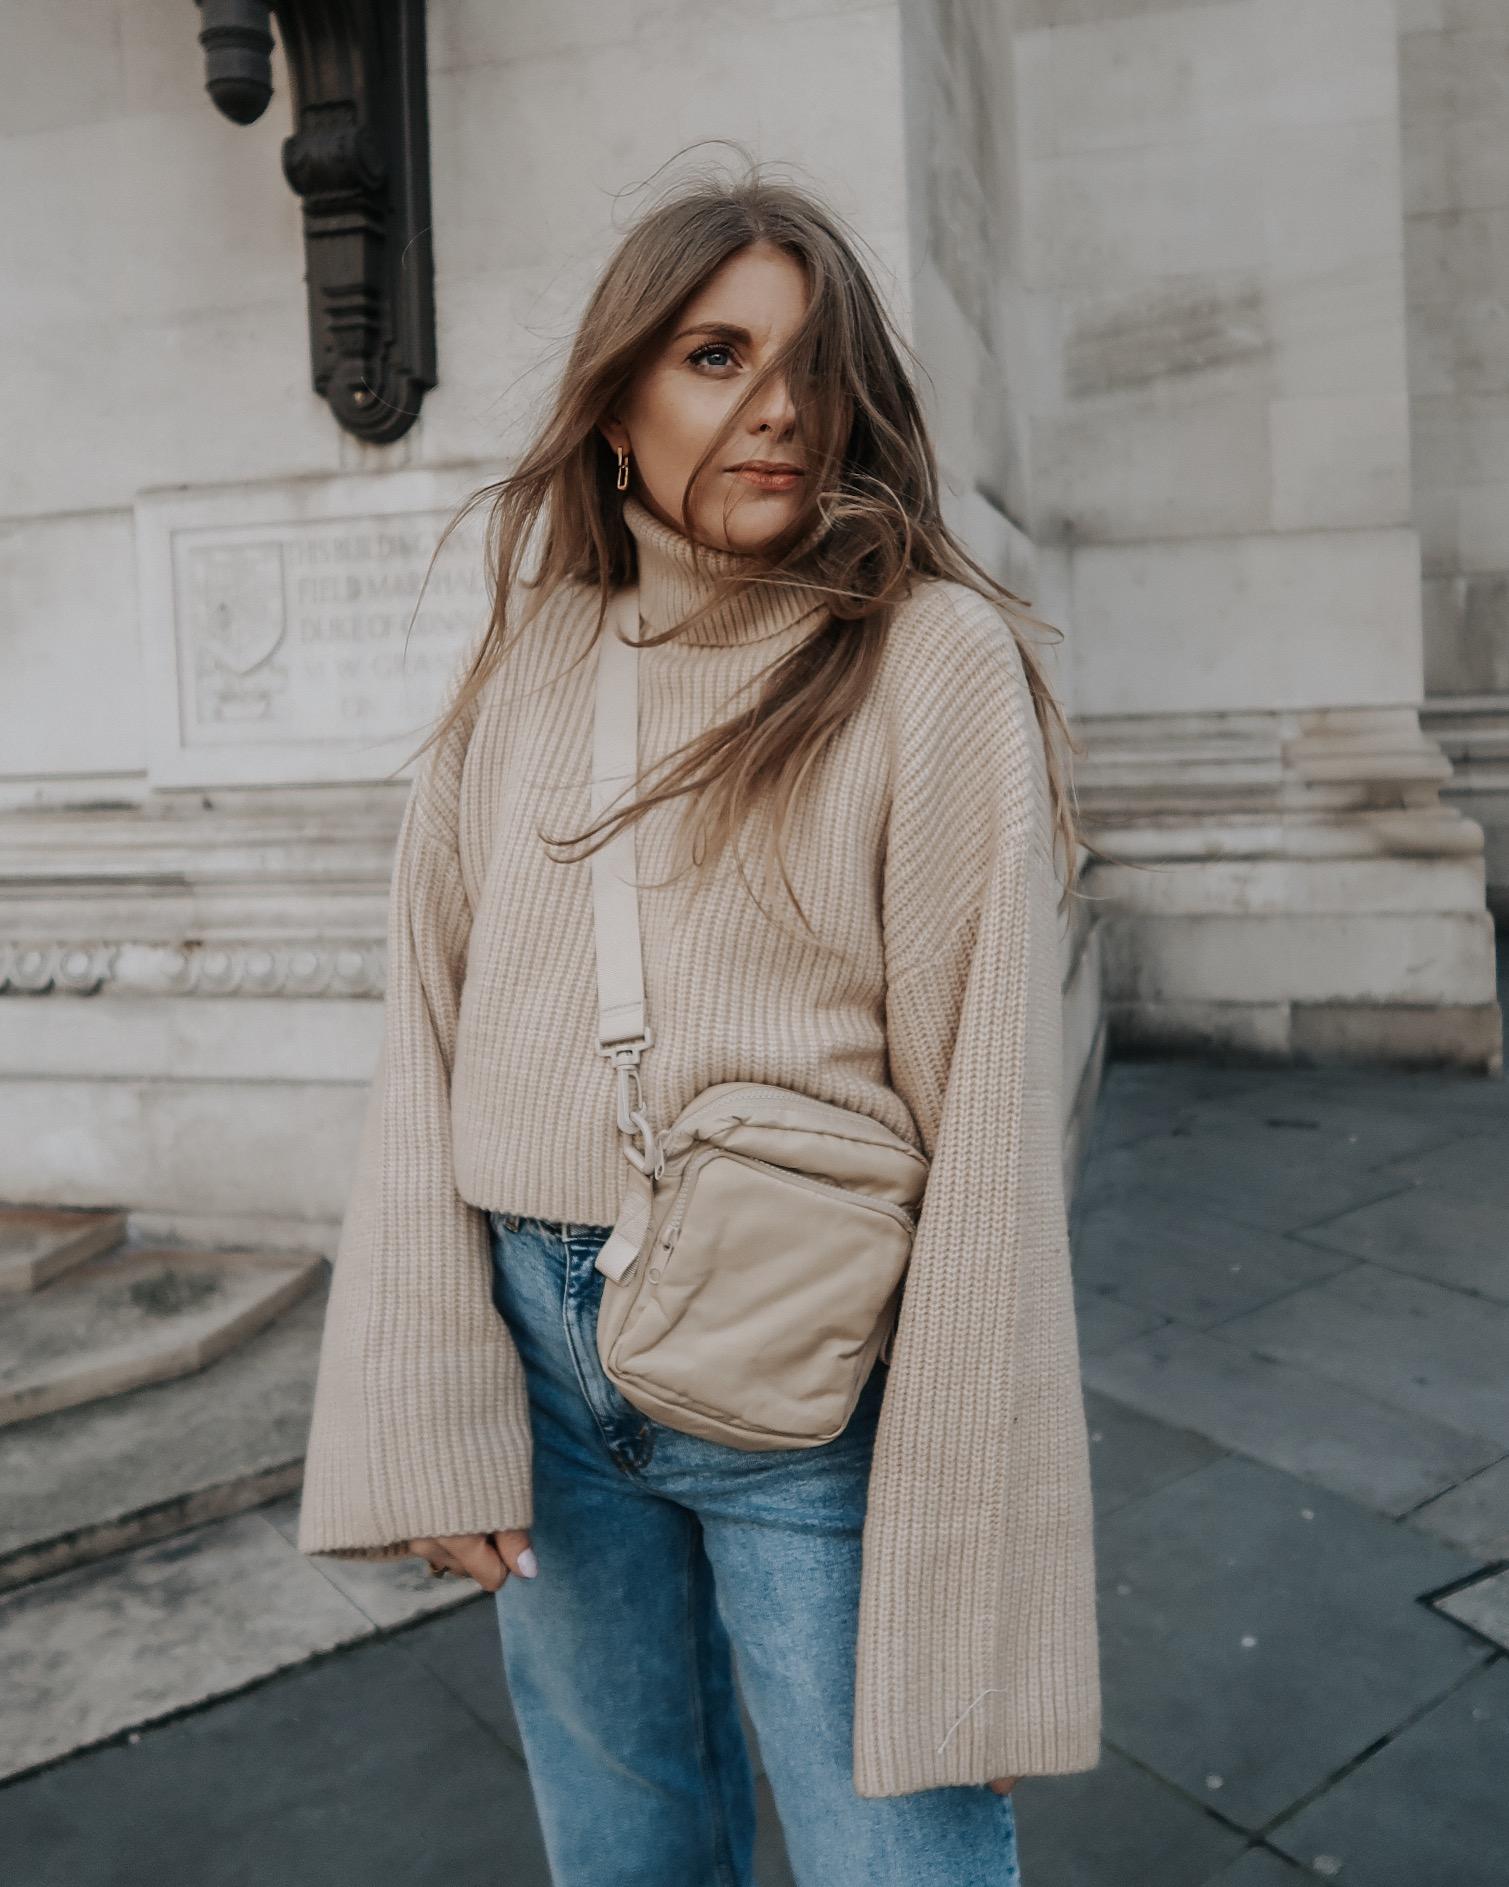 Monki Jeans Straight Leg jeans - Winter Street Style